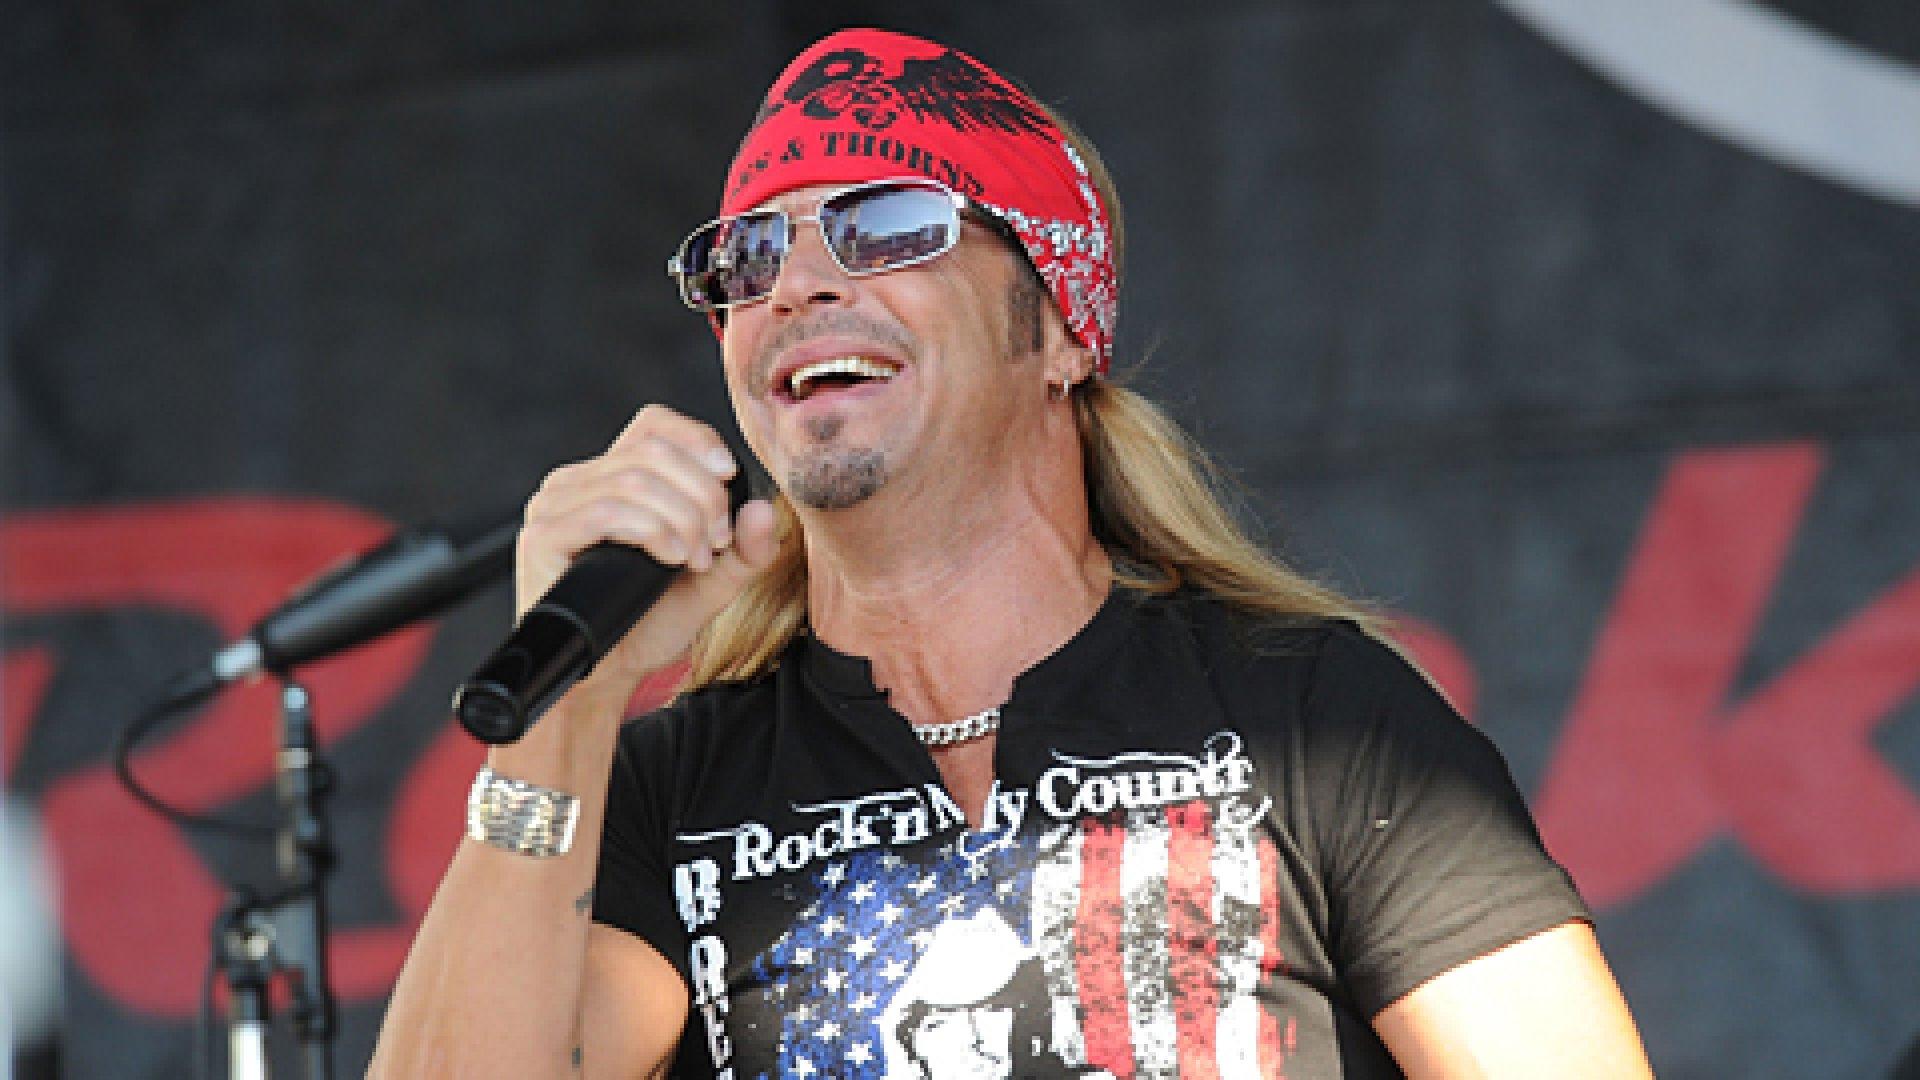 Singer Bret Michaels attends the Dodge Rock n' Roll Half Marathon and Mini Marathon to benefit the ASPCA